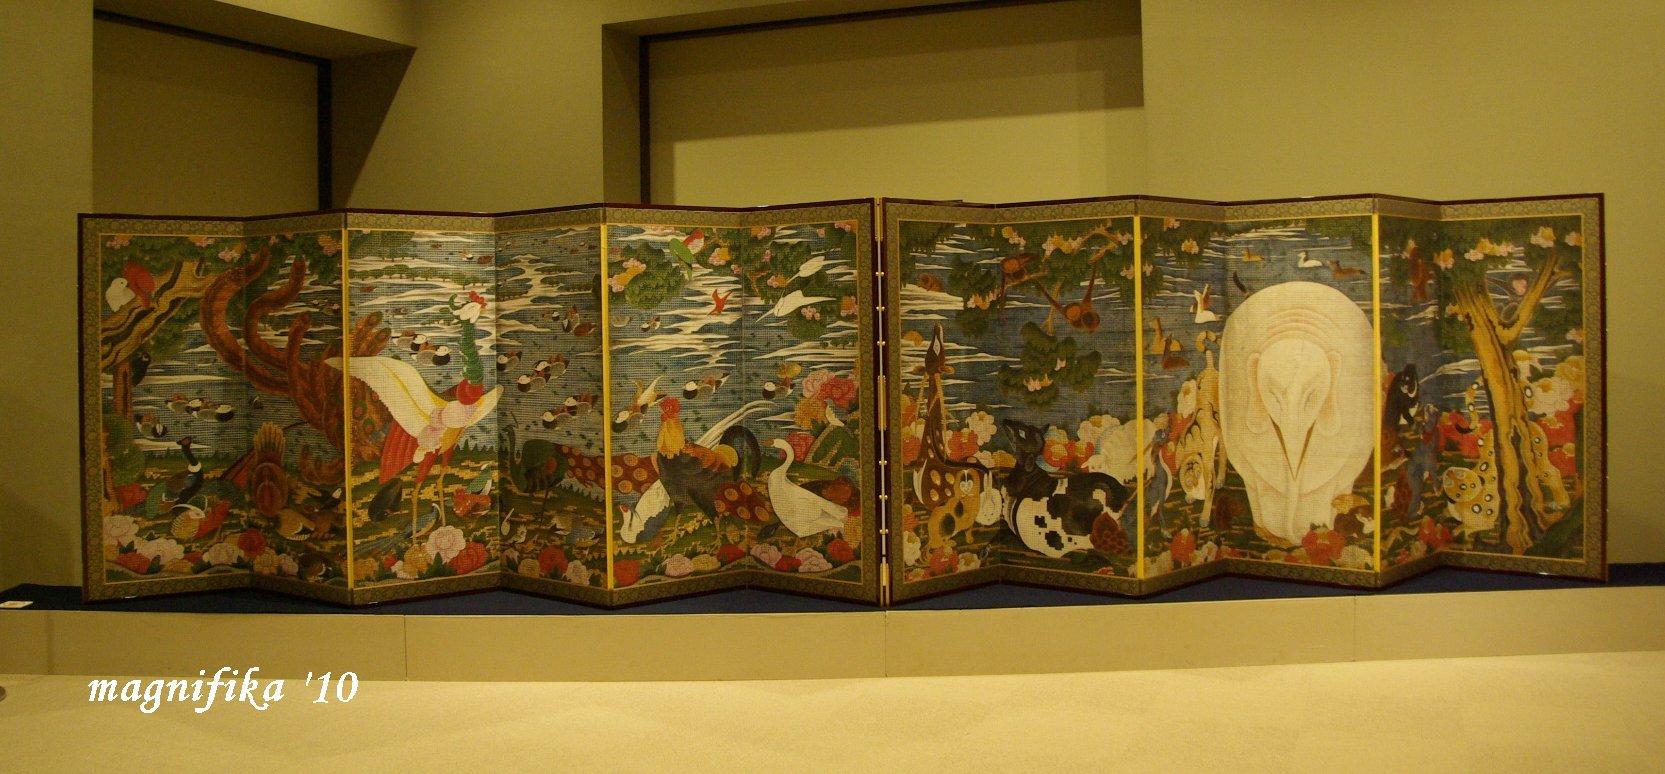 伊藤若冲展 Ito Jakuchu Exhibition_e0140365_0512848.jpg